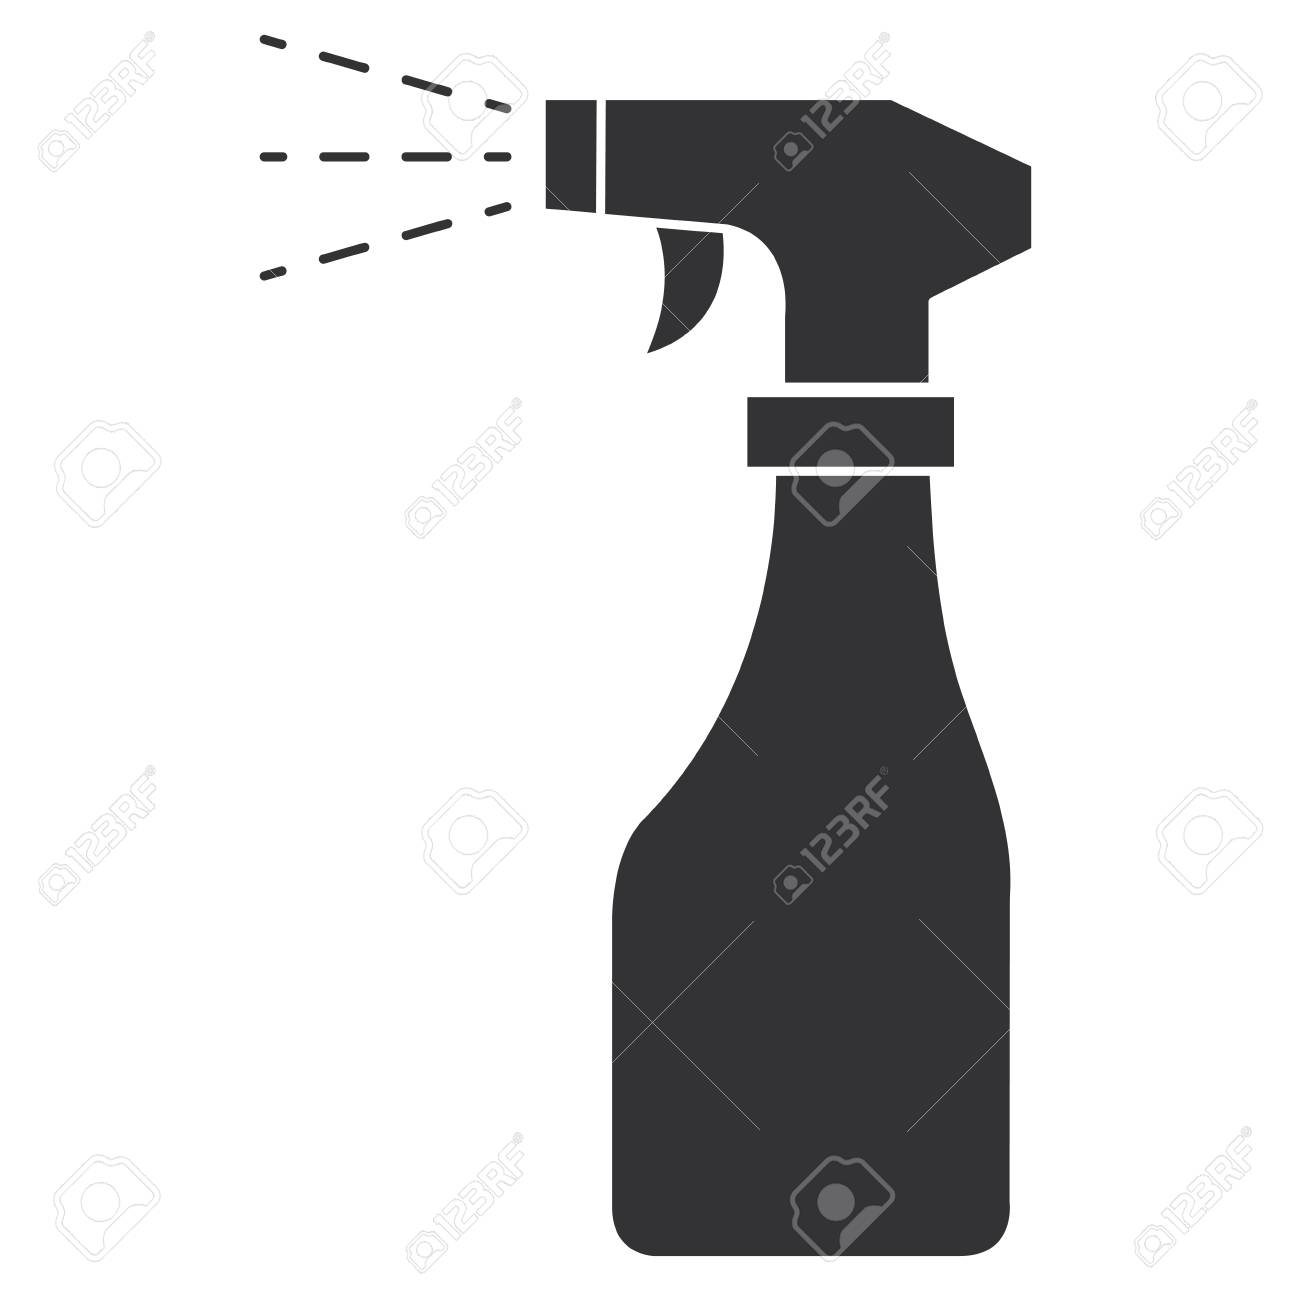 spray bottle isolated icon vector illustration design - 90403227